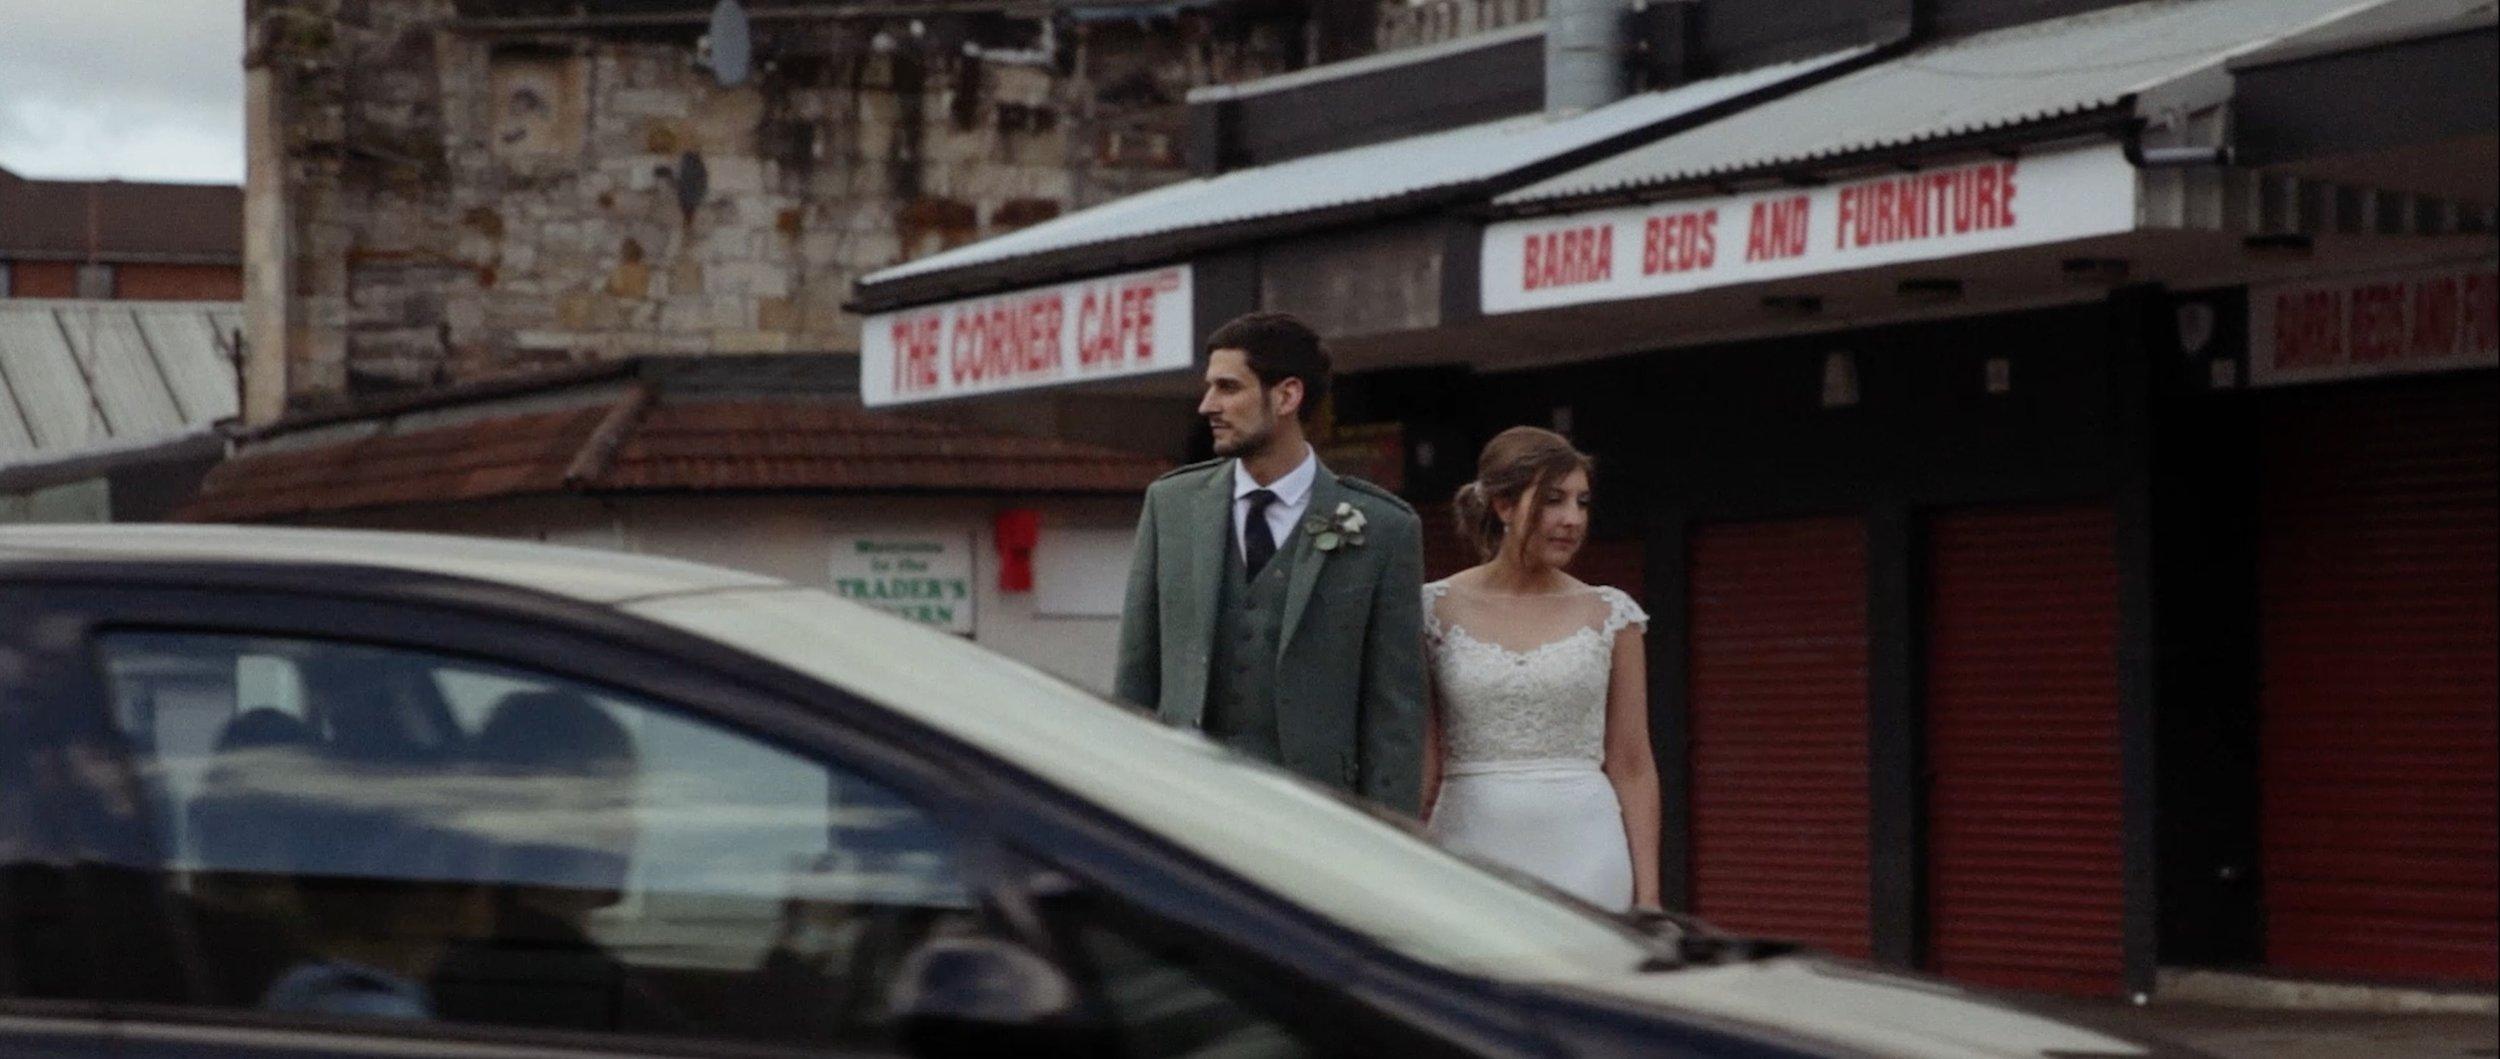 cambo-estate-wedding-videographer_LL_05.jpg